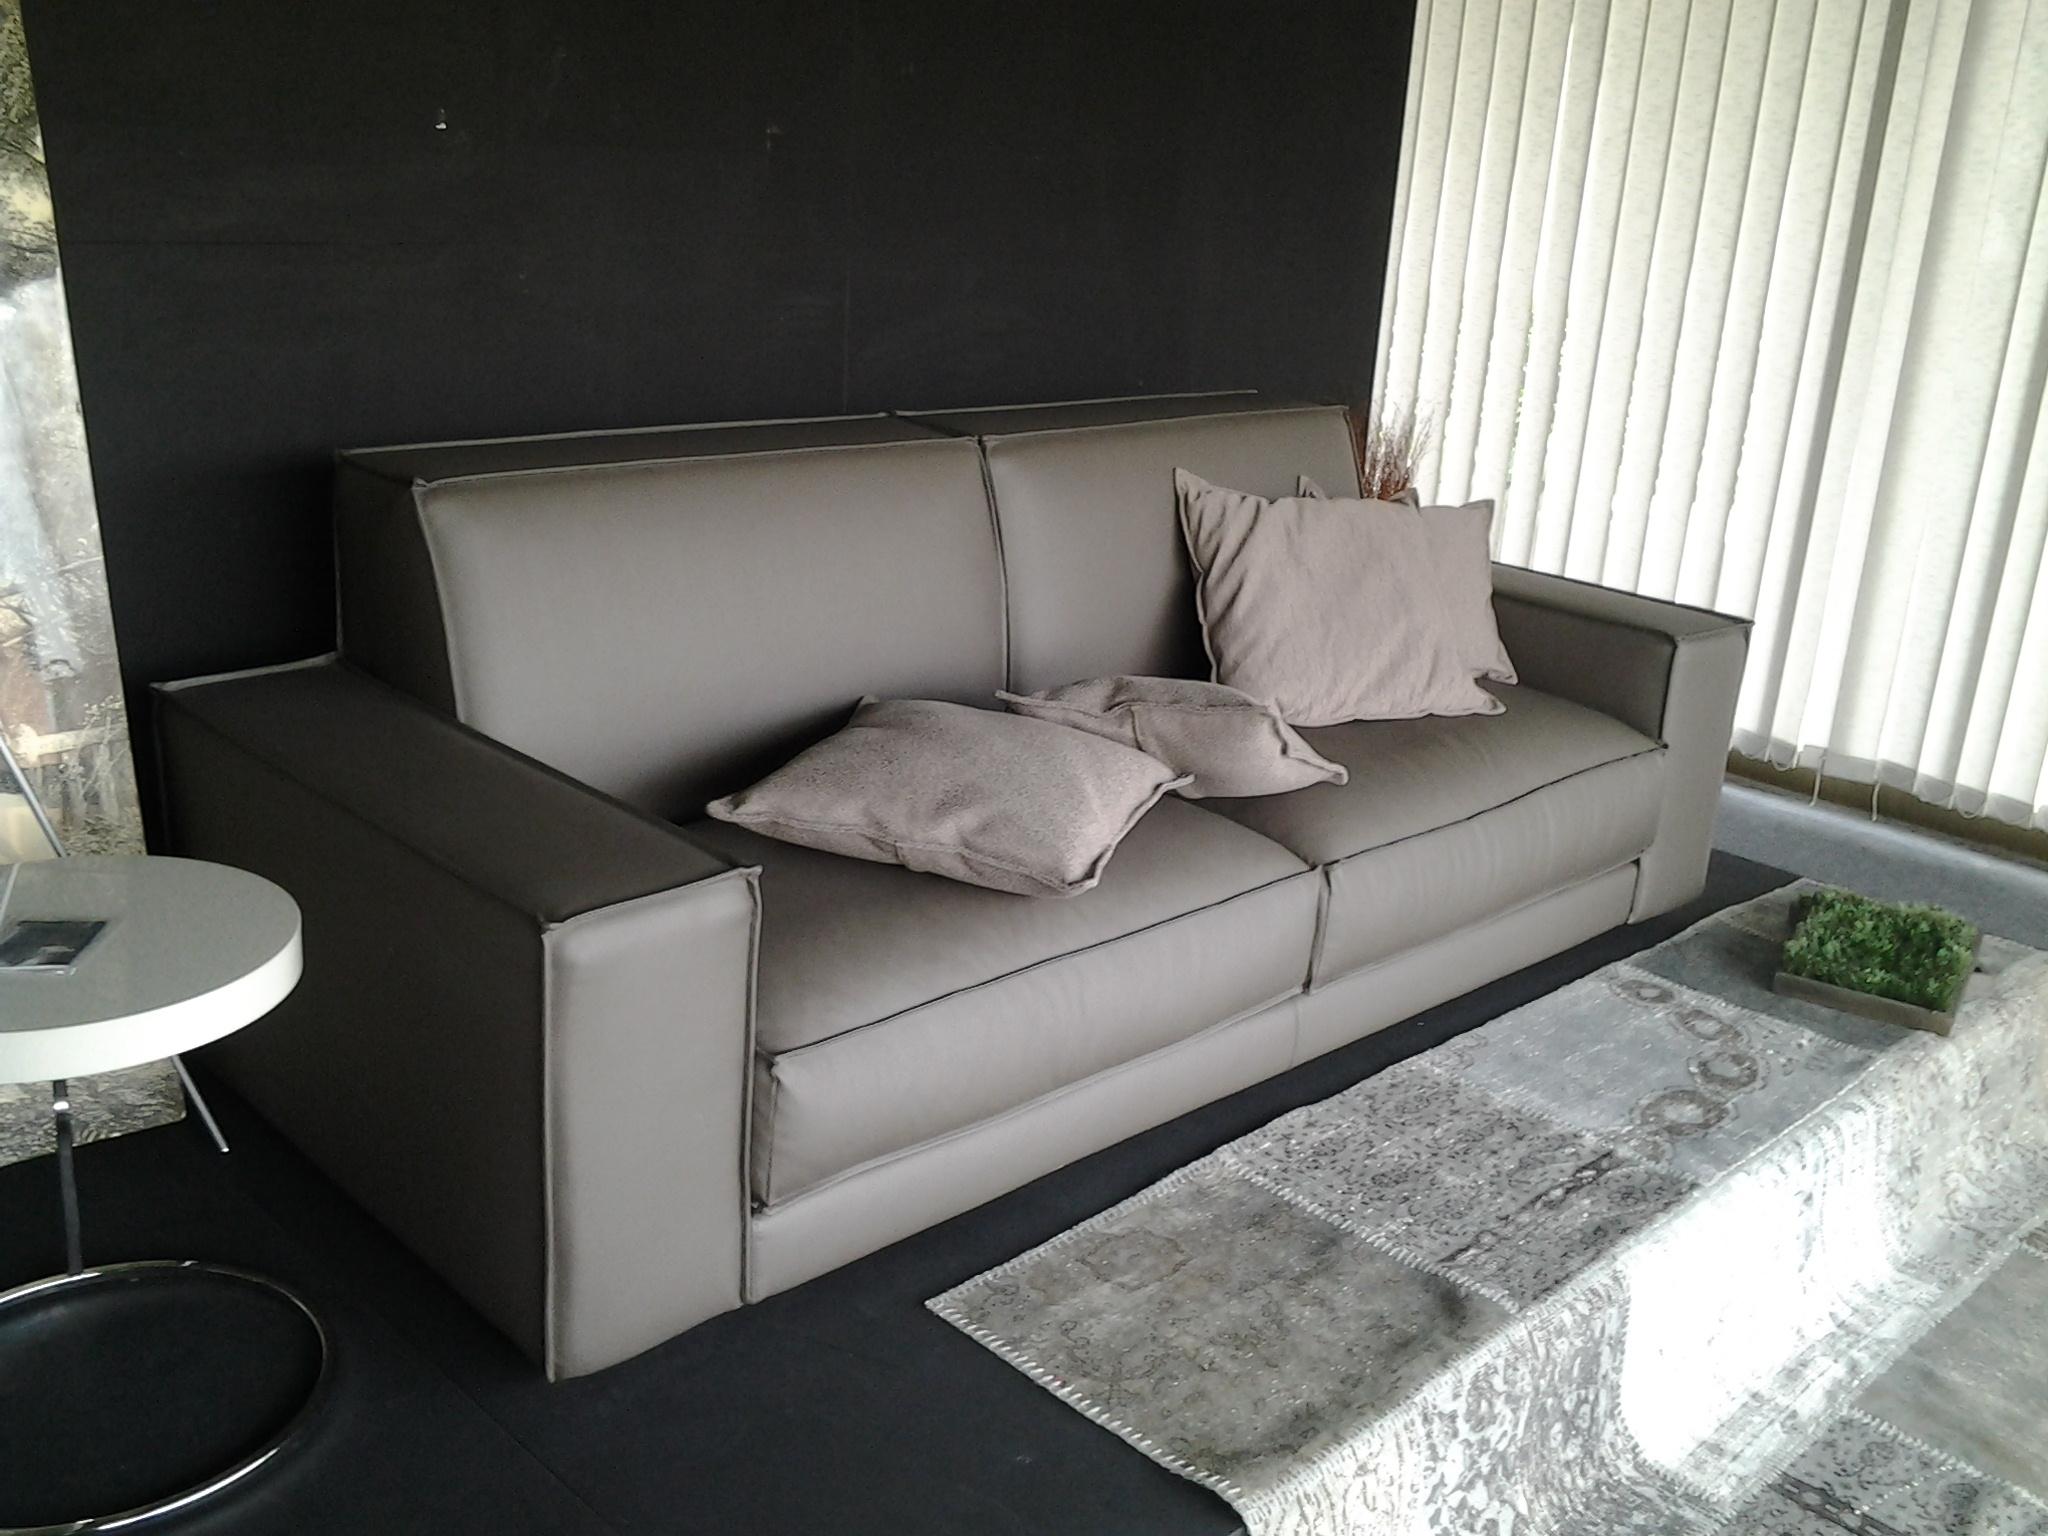 Ditre italia divano buble 39 divani lineari ecopelle divano for Divani 3 posti moderni